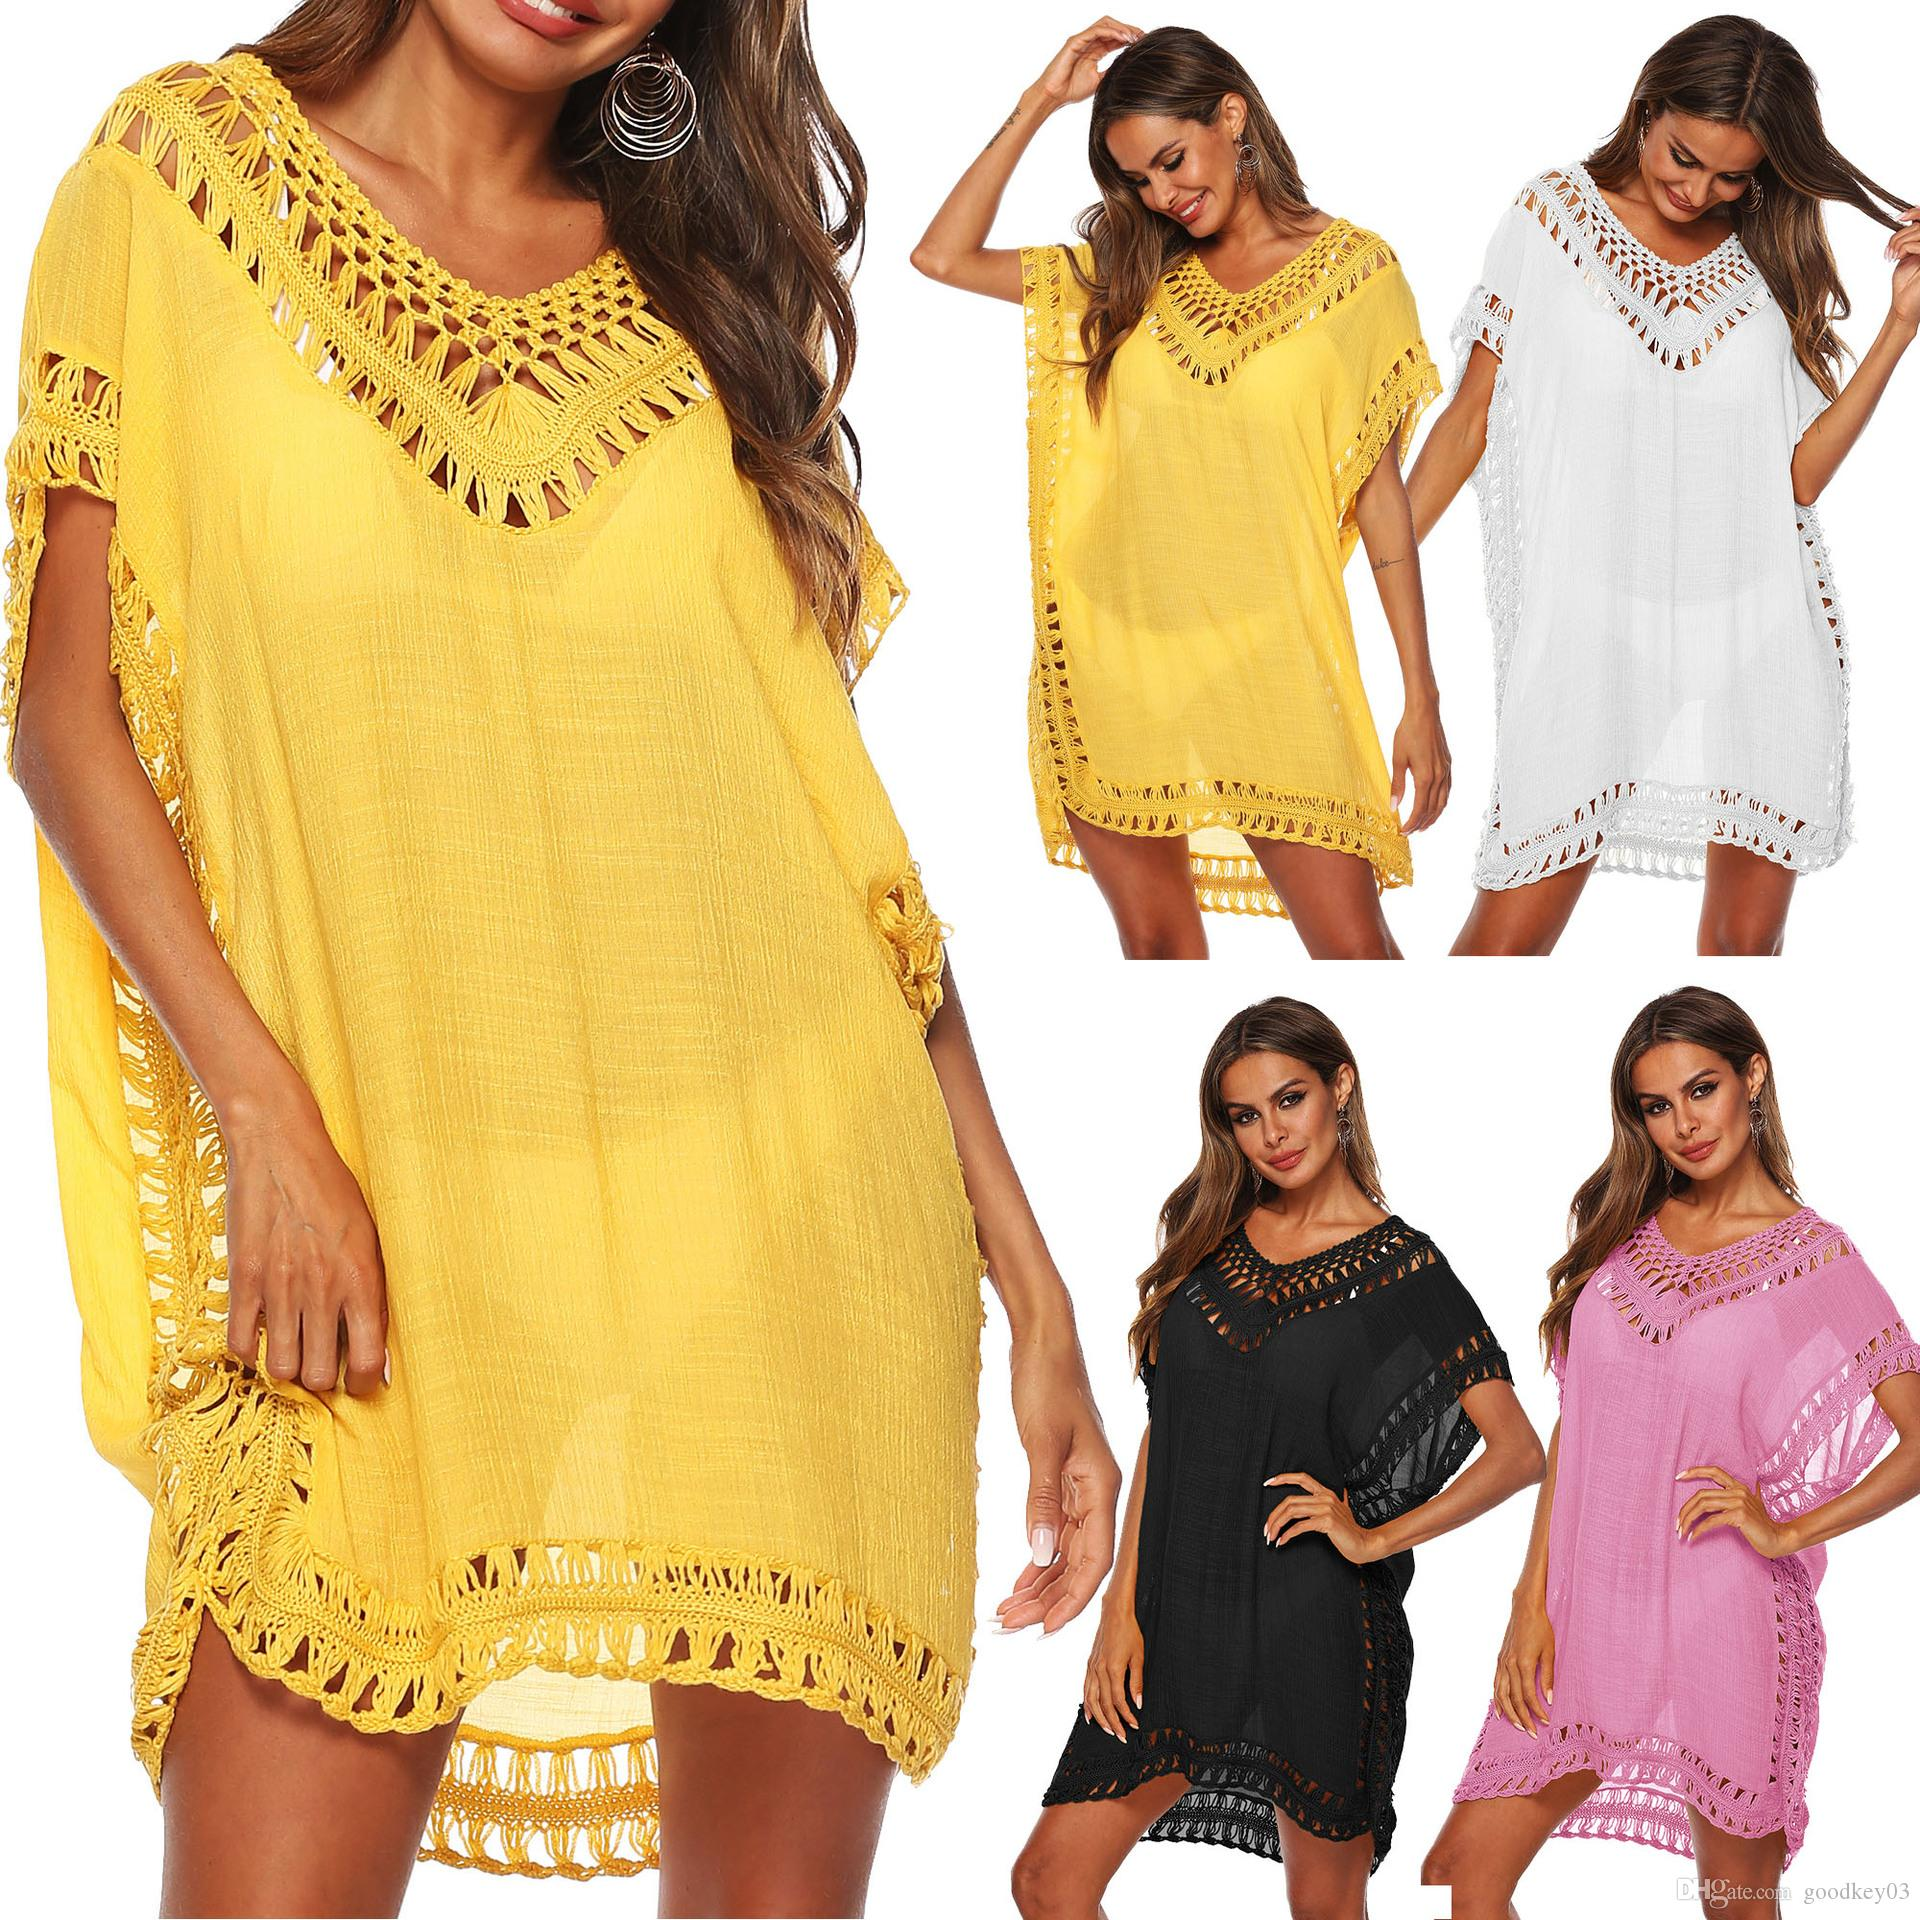 1b358c5a7b2 2019 Kaftan Tunic Beach Dress 2019 Lady Bikini Swim Wear Summer Swimsuit  Cover Up Boho White Yellow V Neck Dresses Neon Cover Ups From Goodkey03, ...